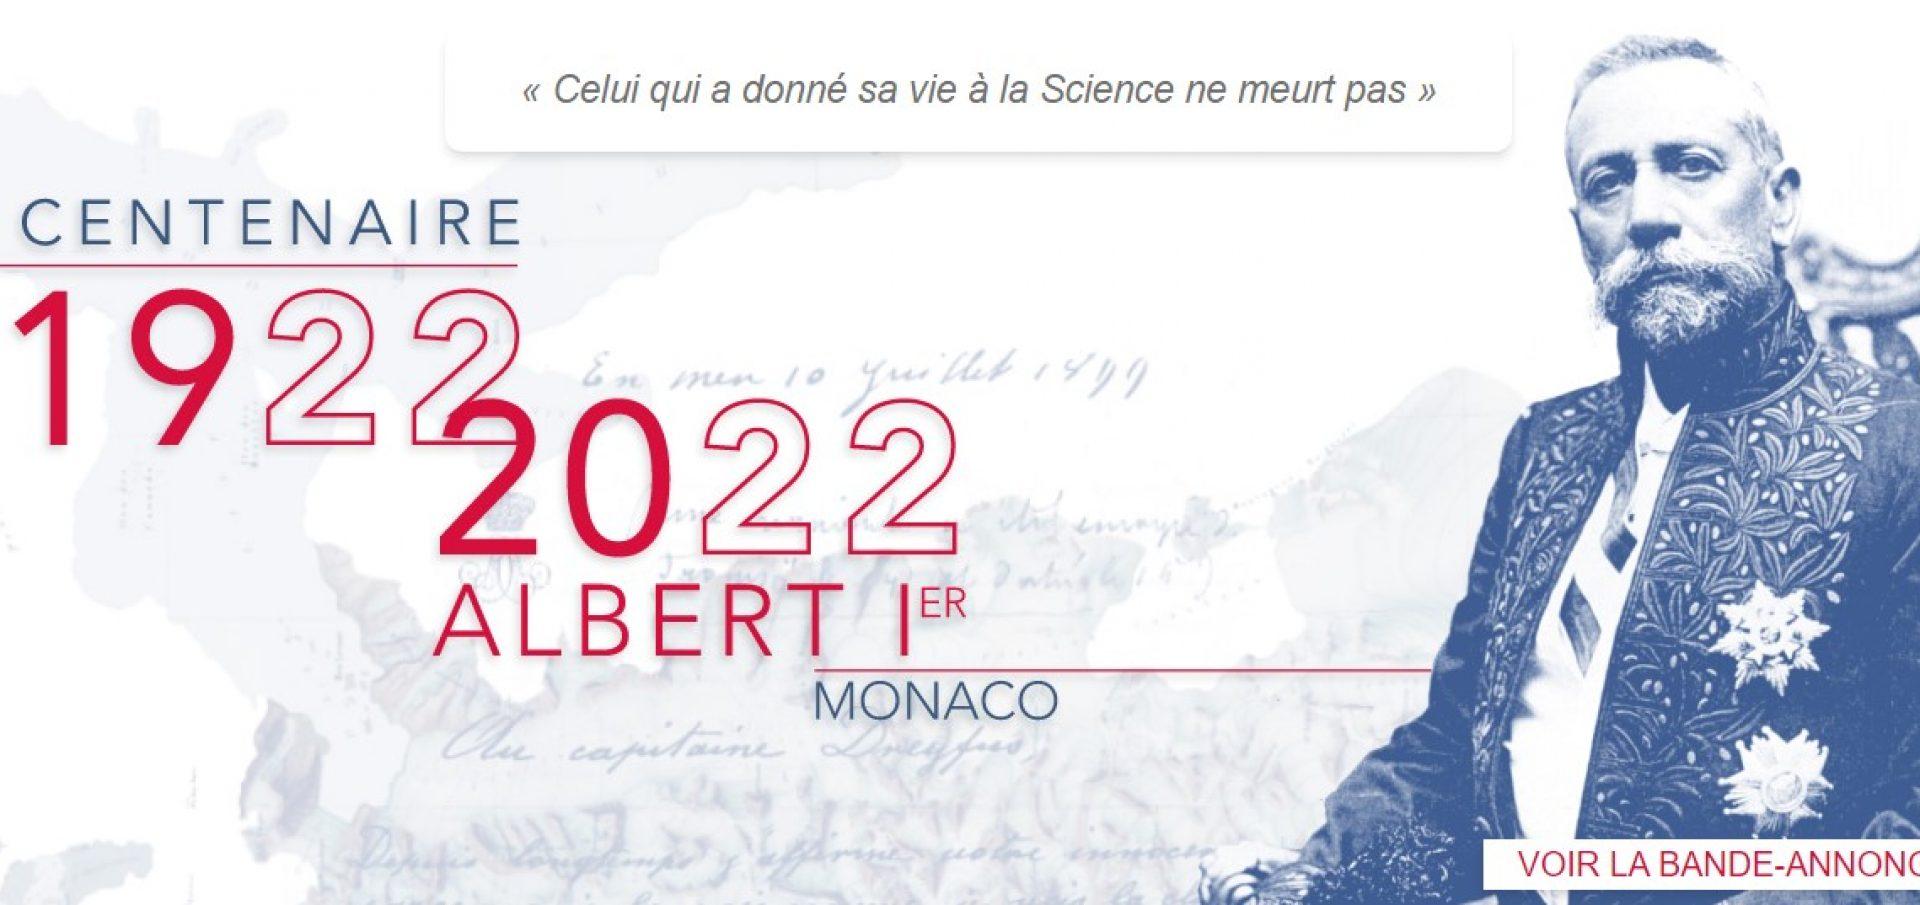 Centenaire - SAS Le Prince Albert Ier de Monaco